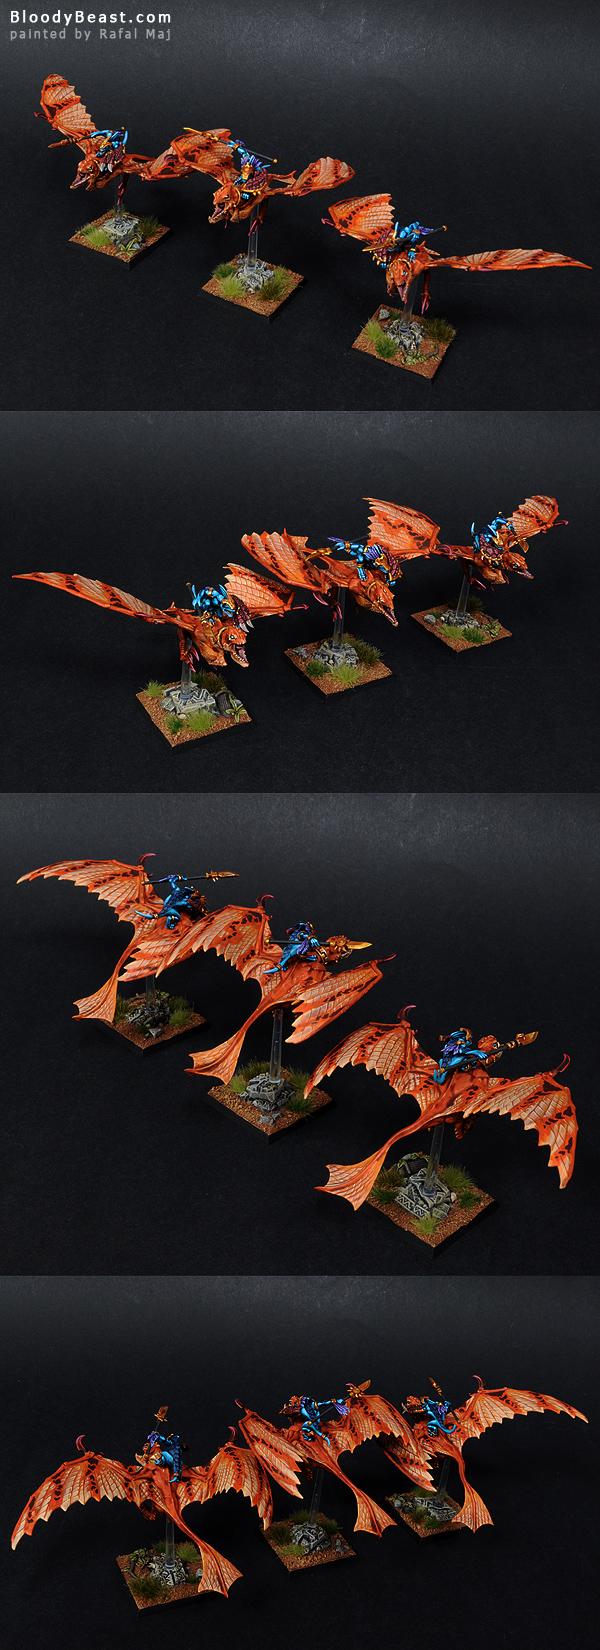 Lizardmen Ripperdactyl Riders painted by Rafal Maj (BloodyBeast.com)